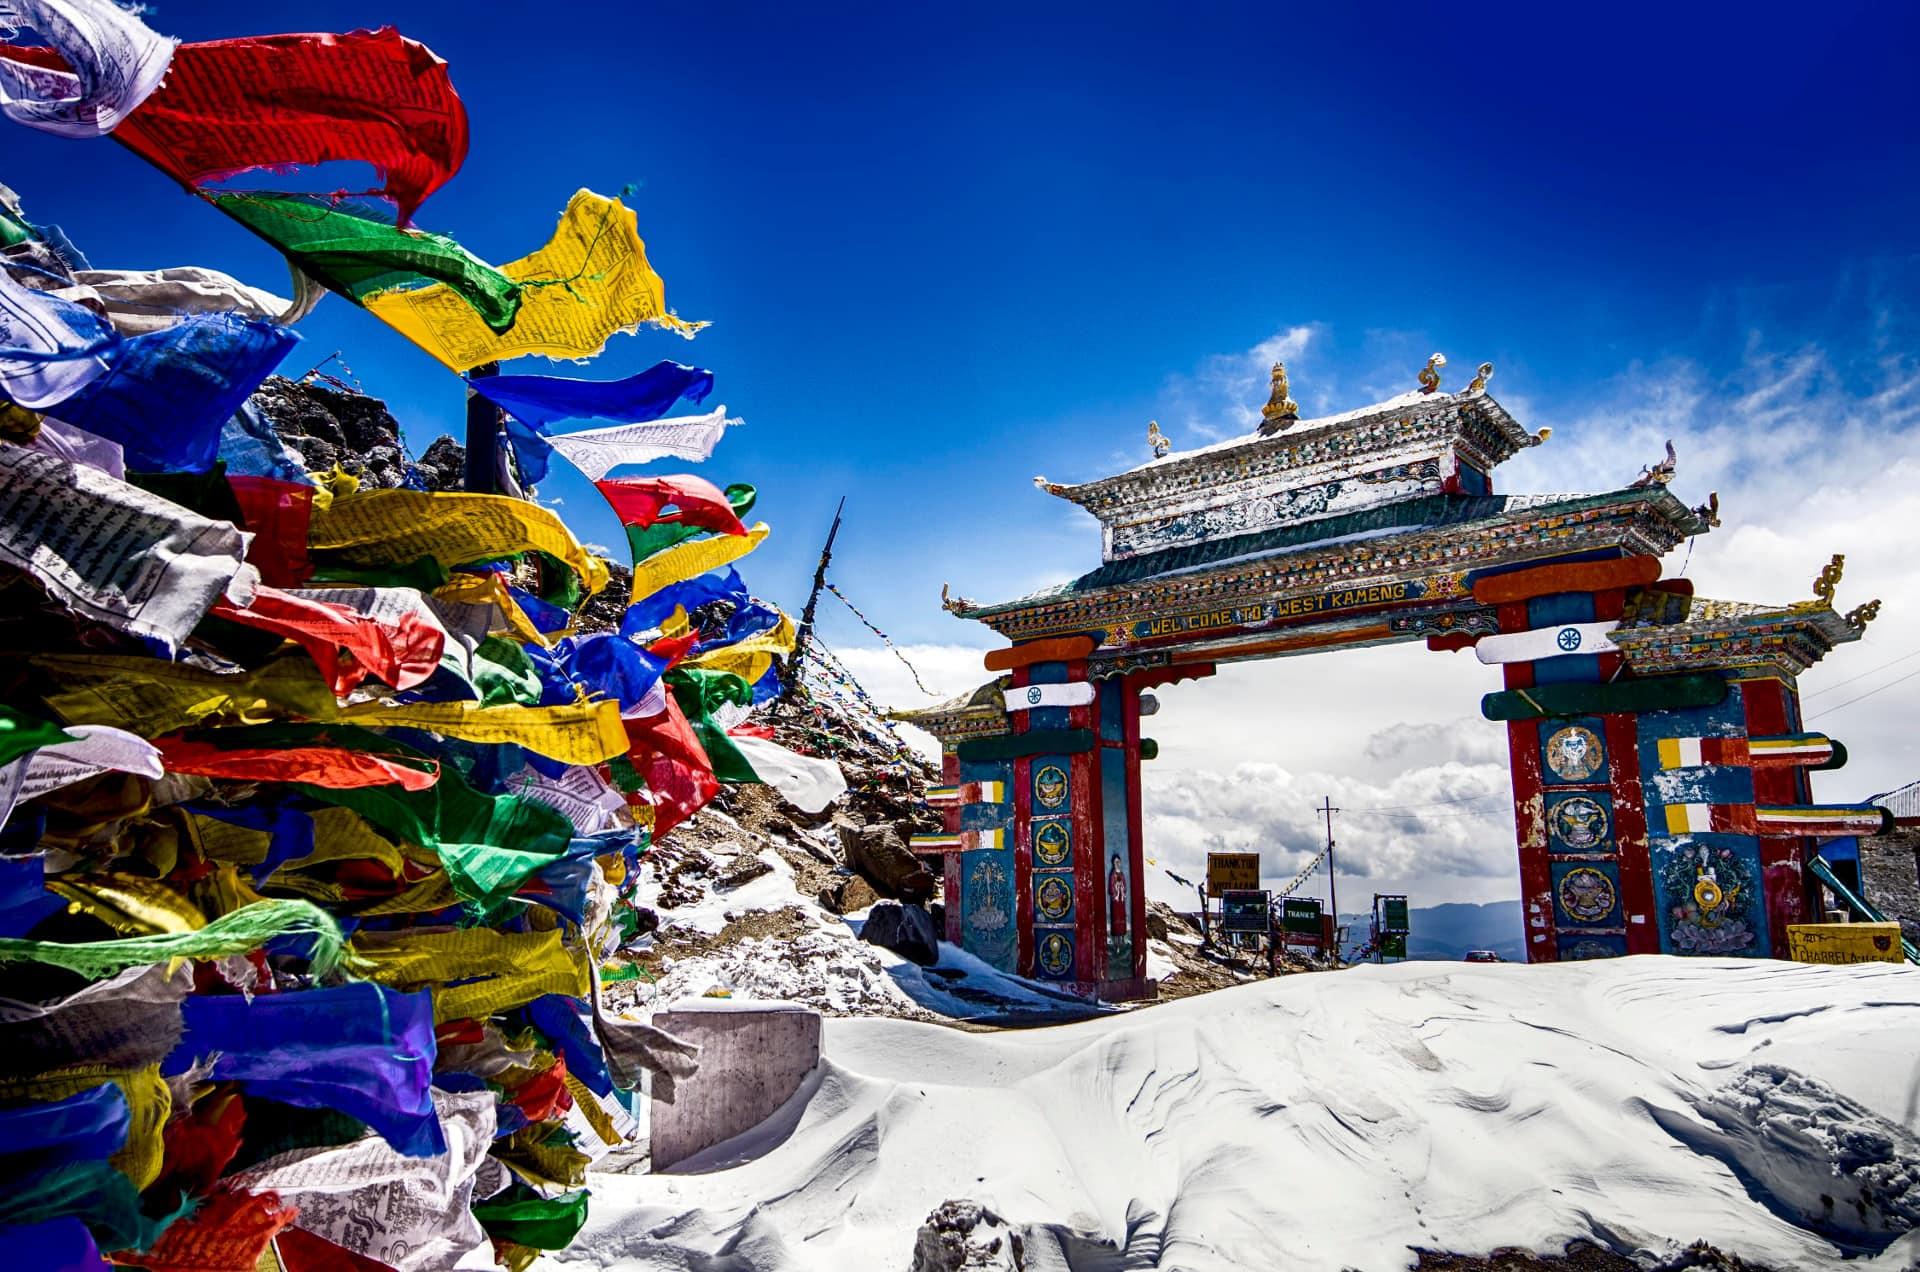 Sela Pass Gate - Tawang in Arunachal Pradesh